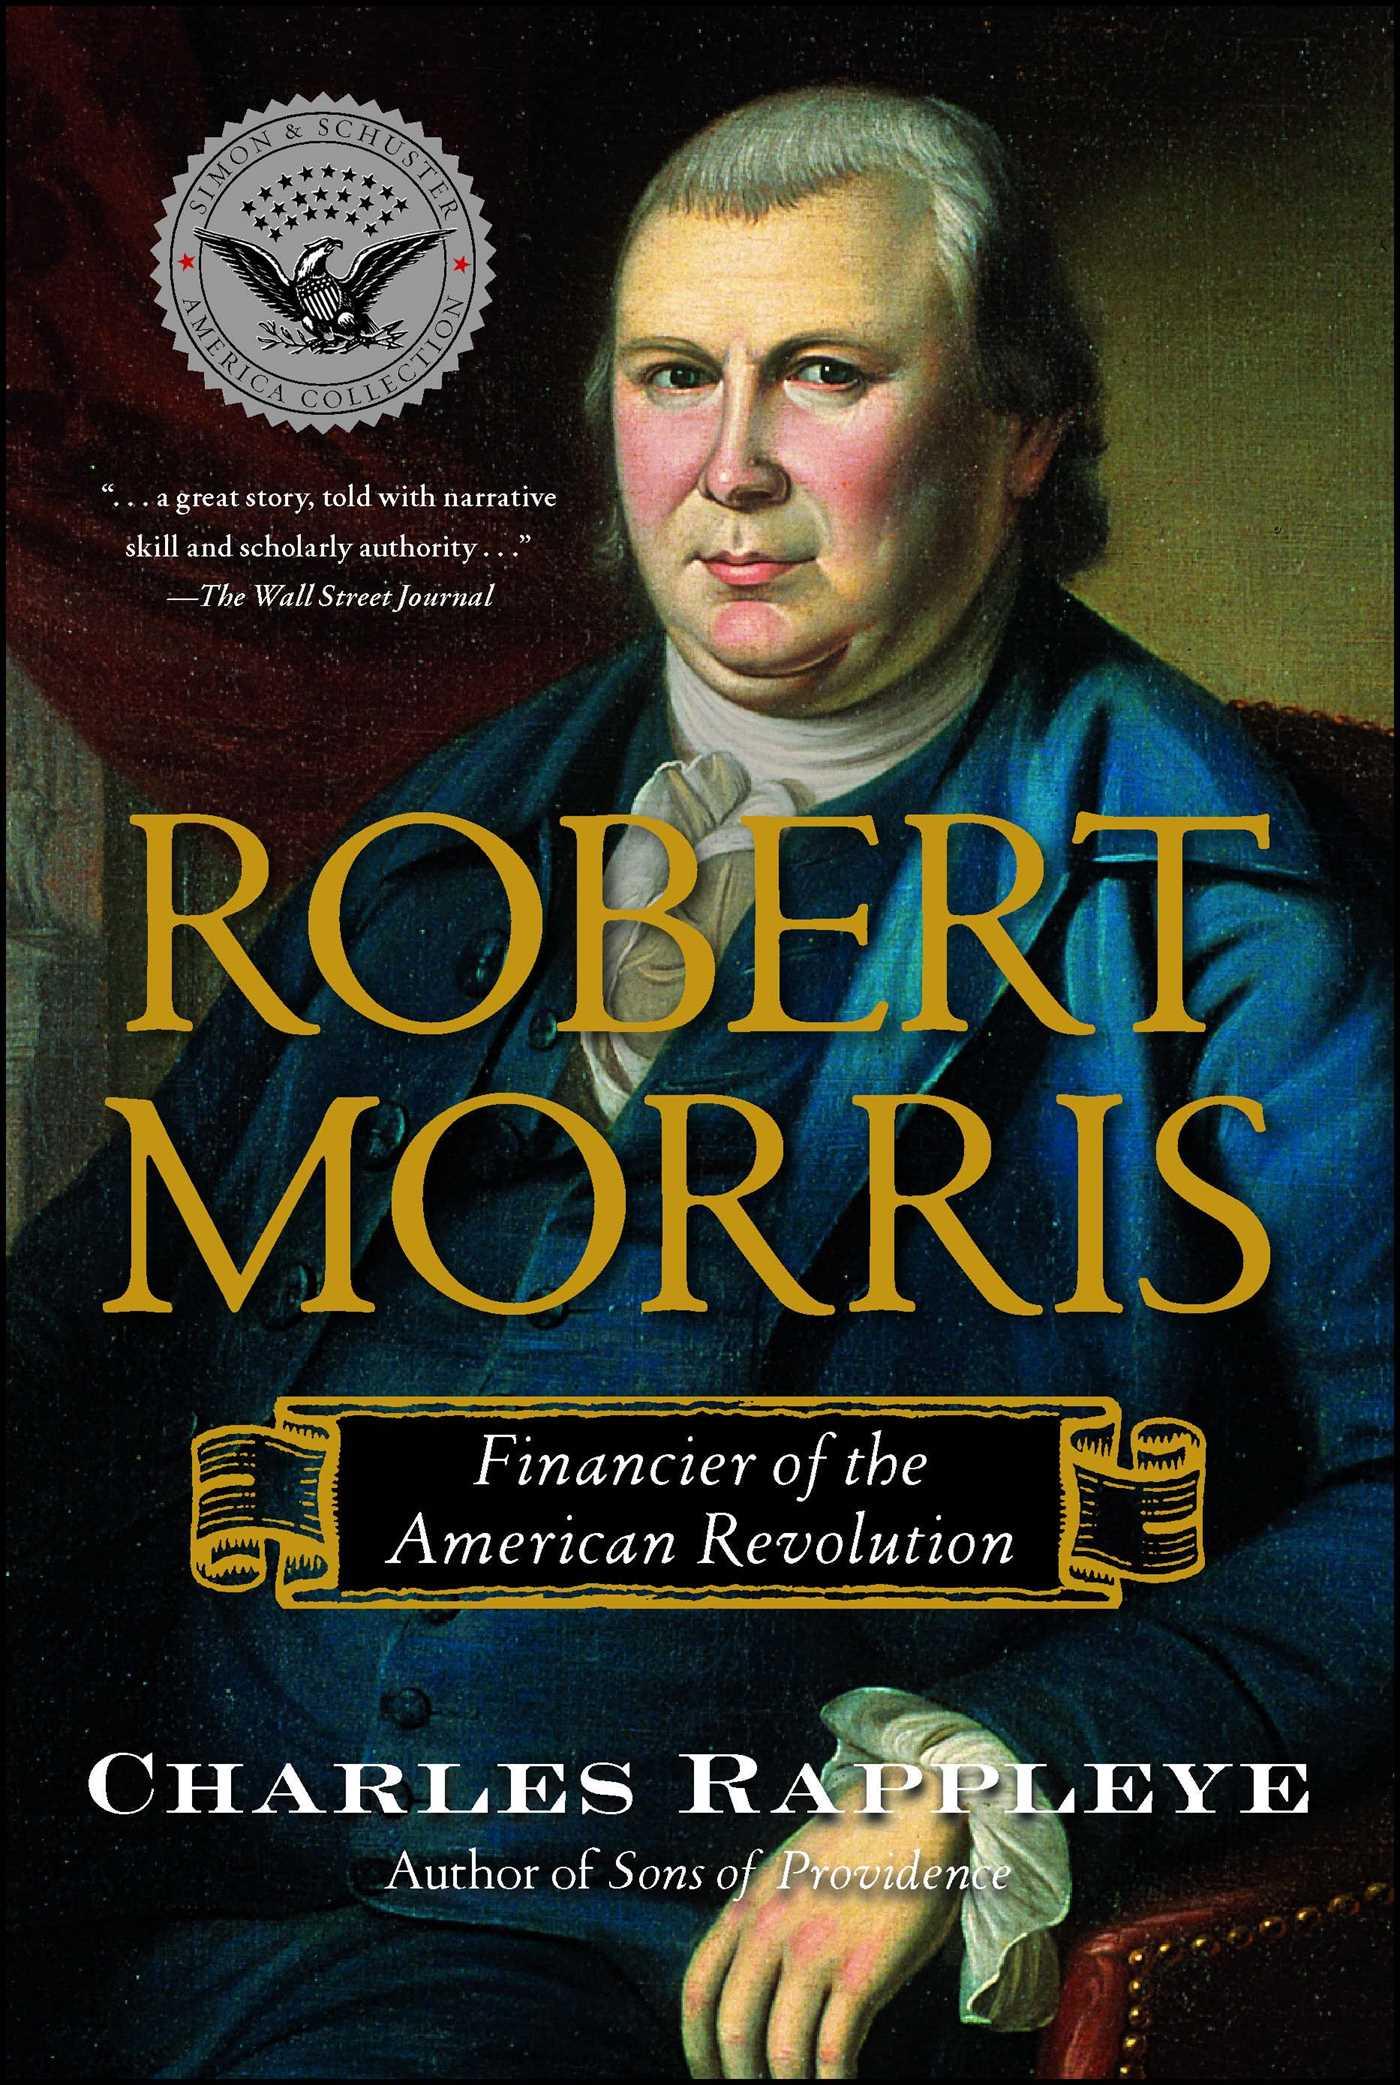 Robert morris 9781416570929 hr